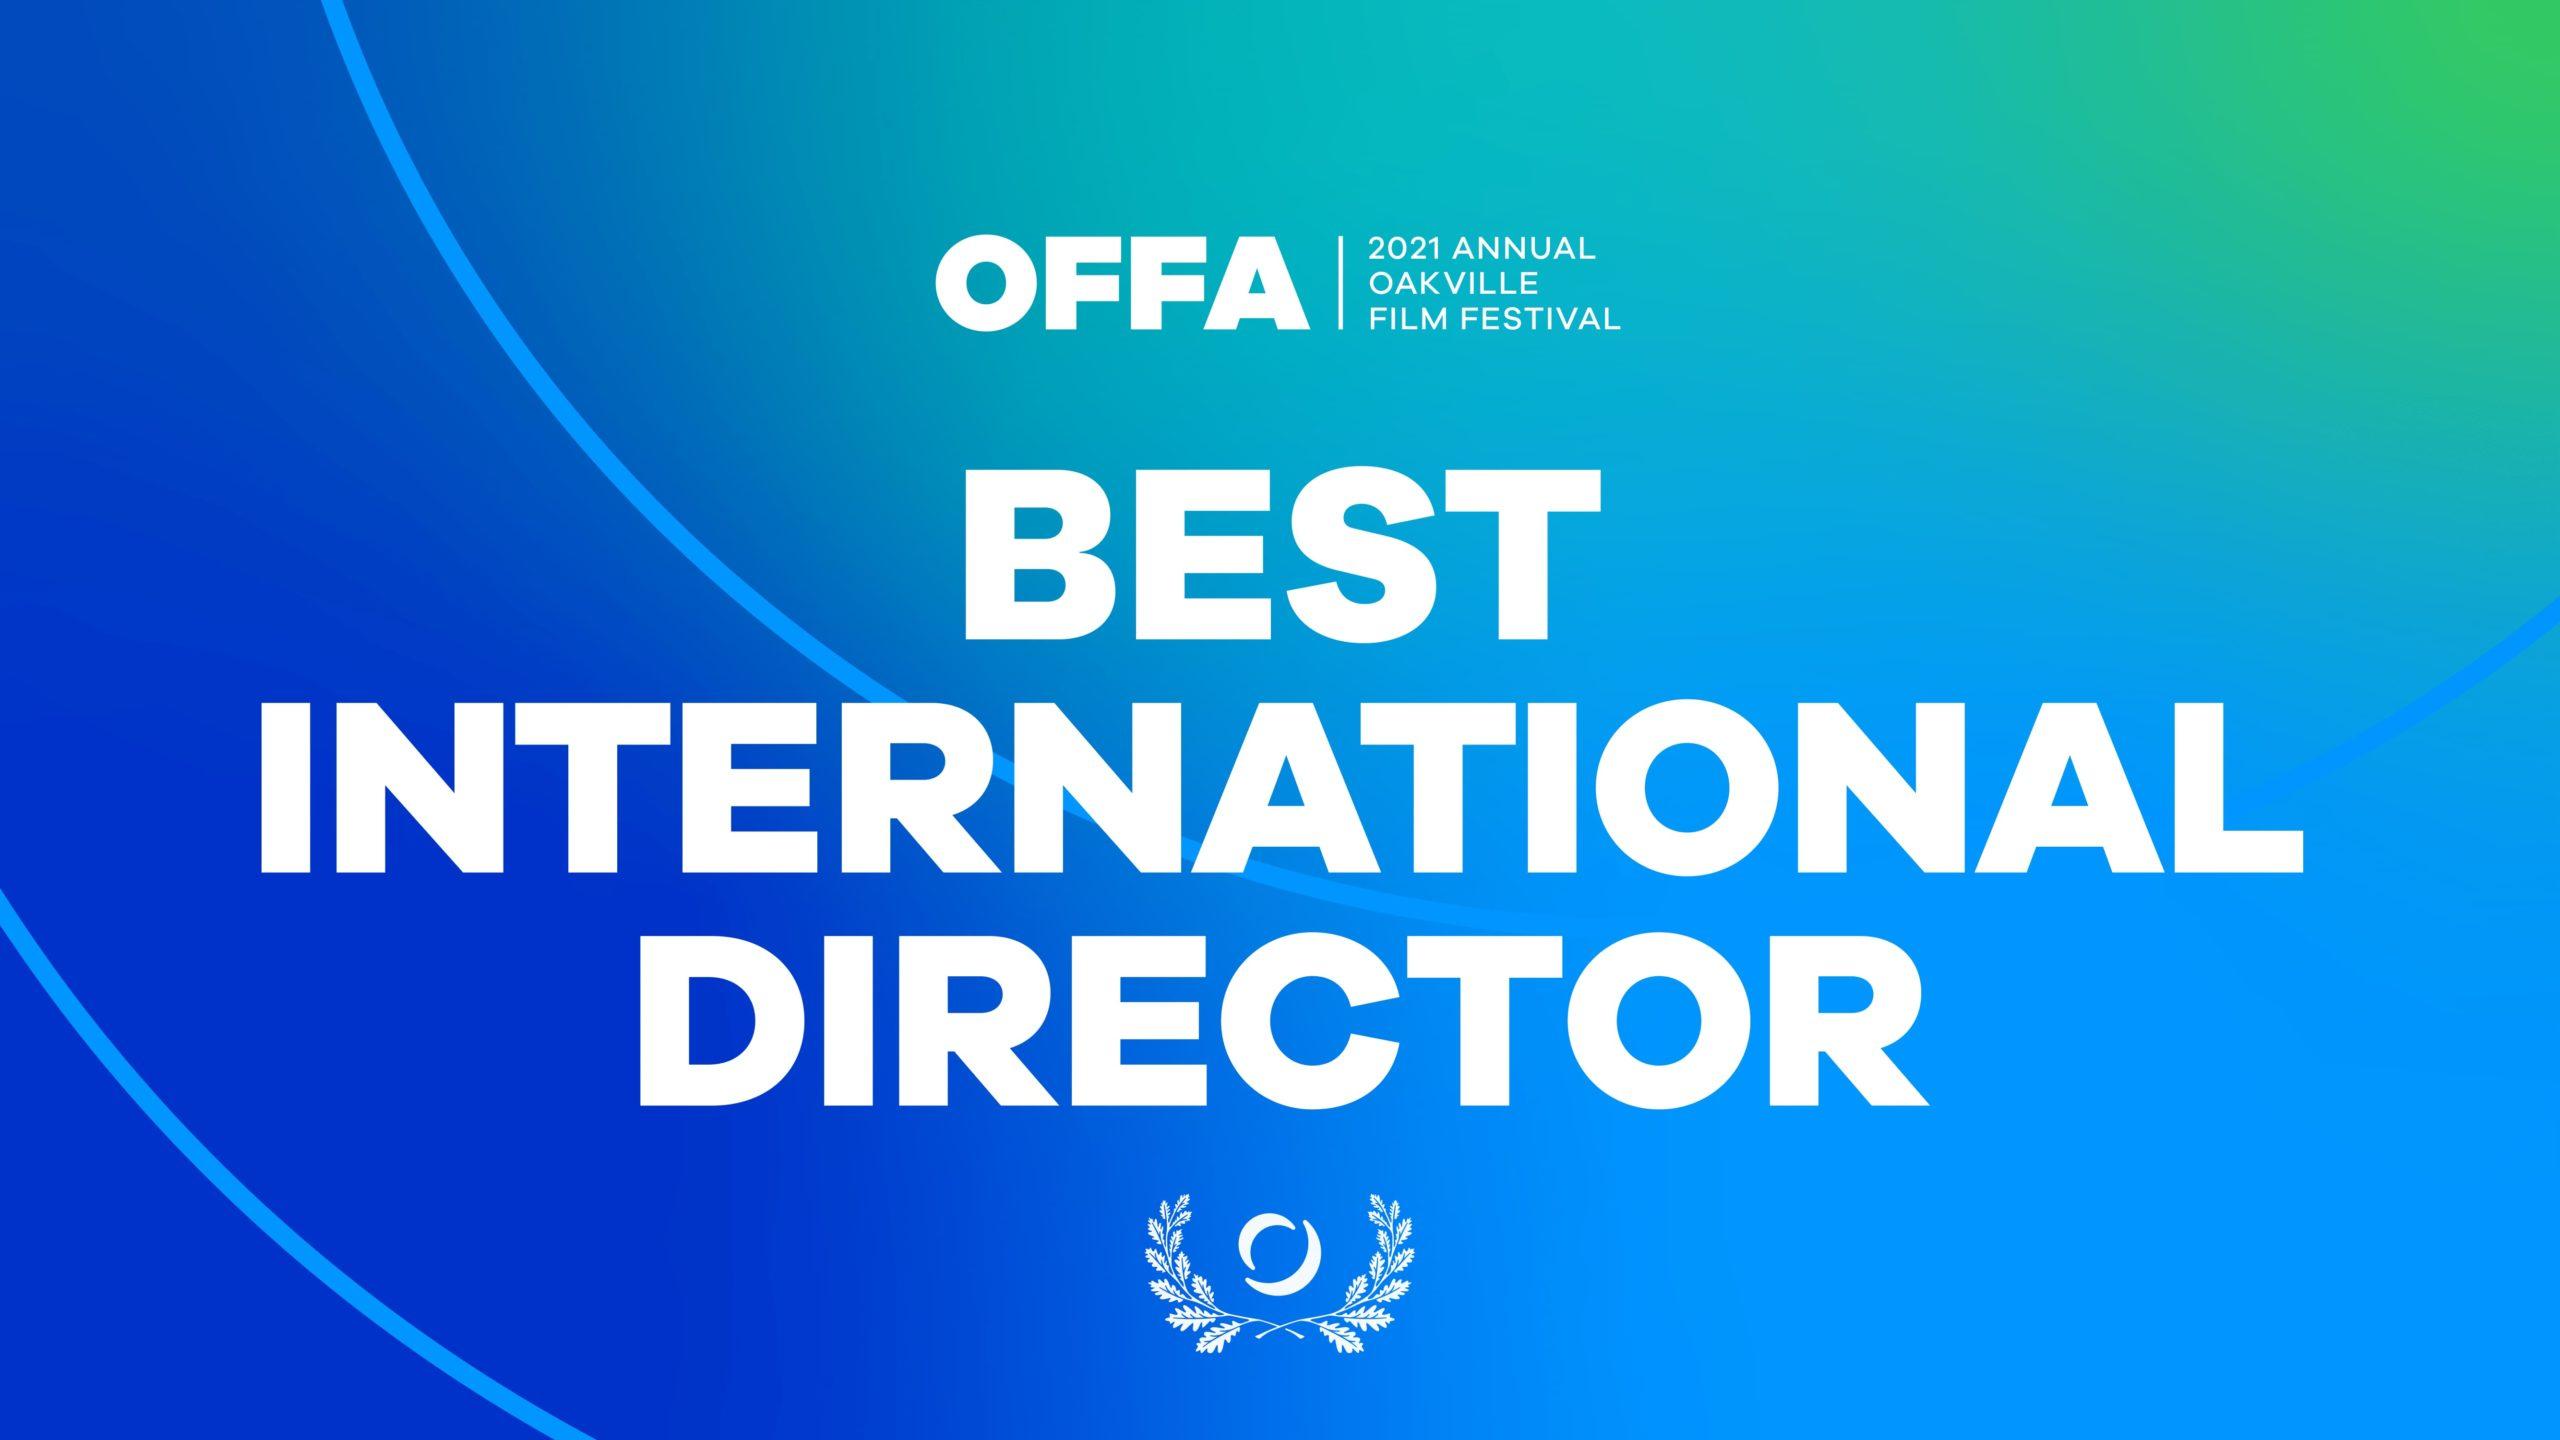 OFFA 2021 Best International Director